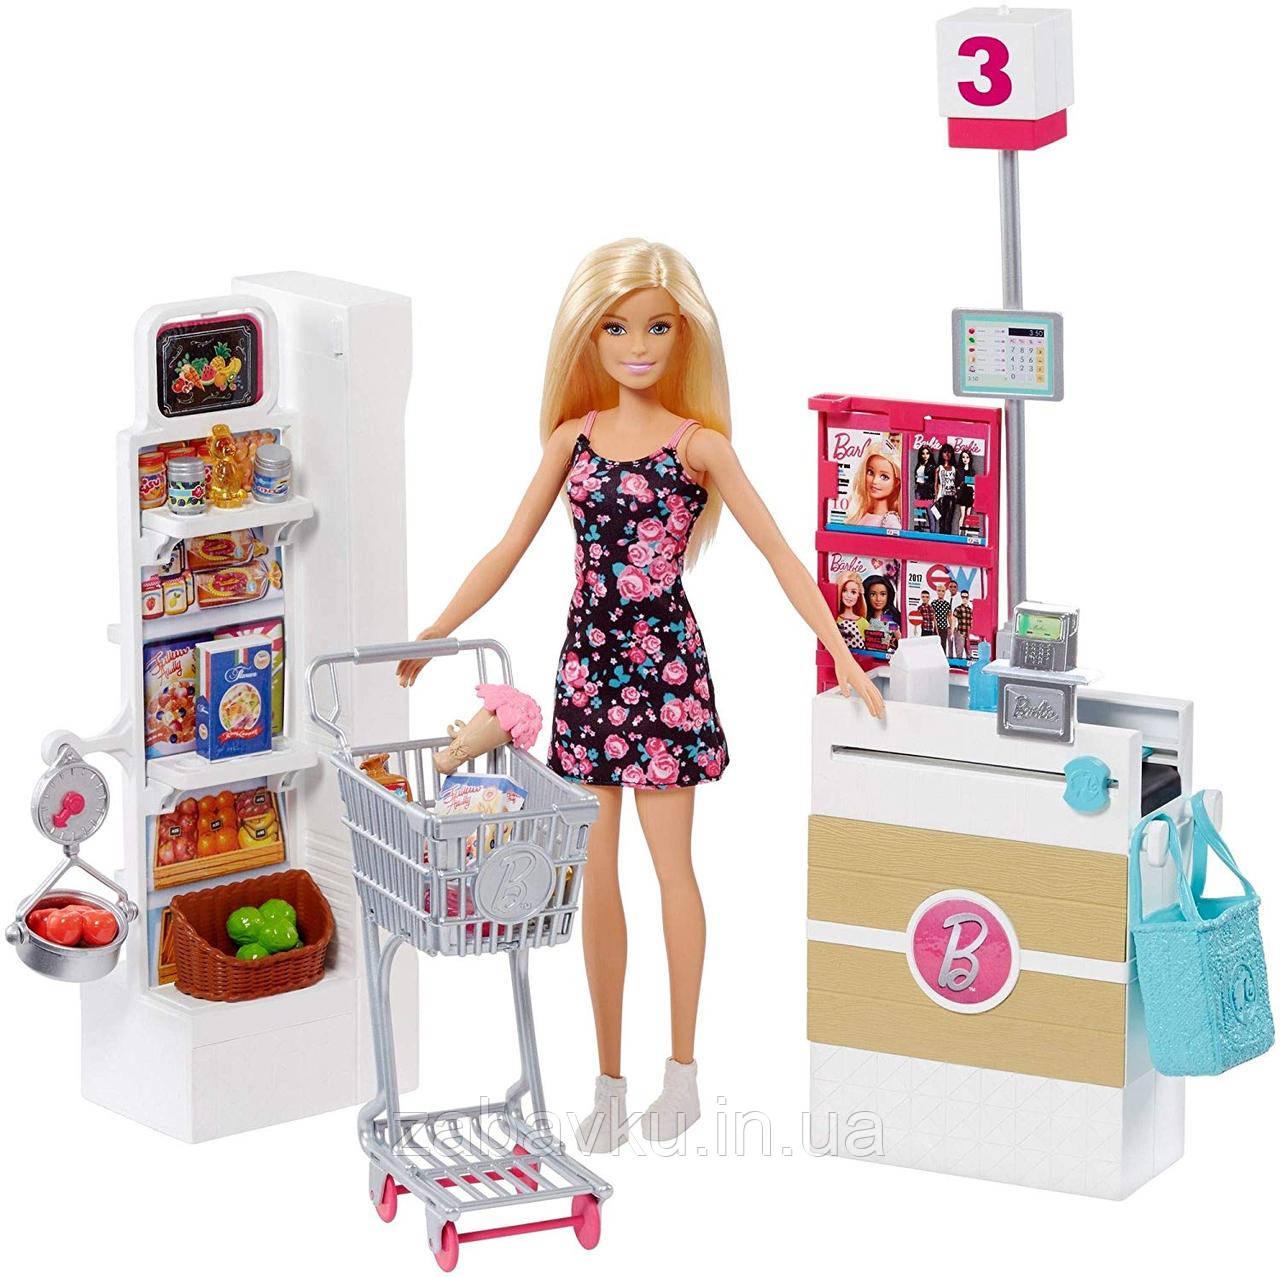 Набір Барбі в супермаркеті Barbie Supermarket Set, Blonde